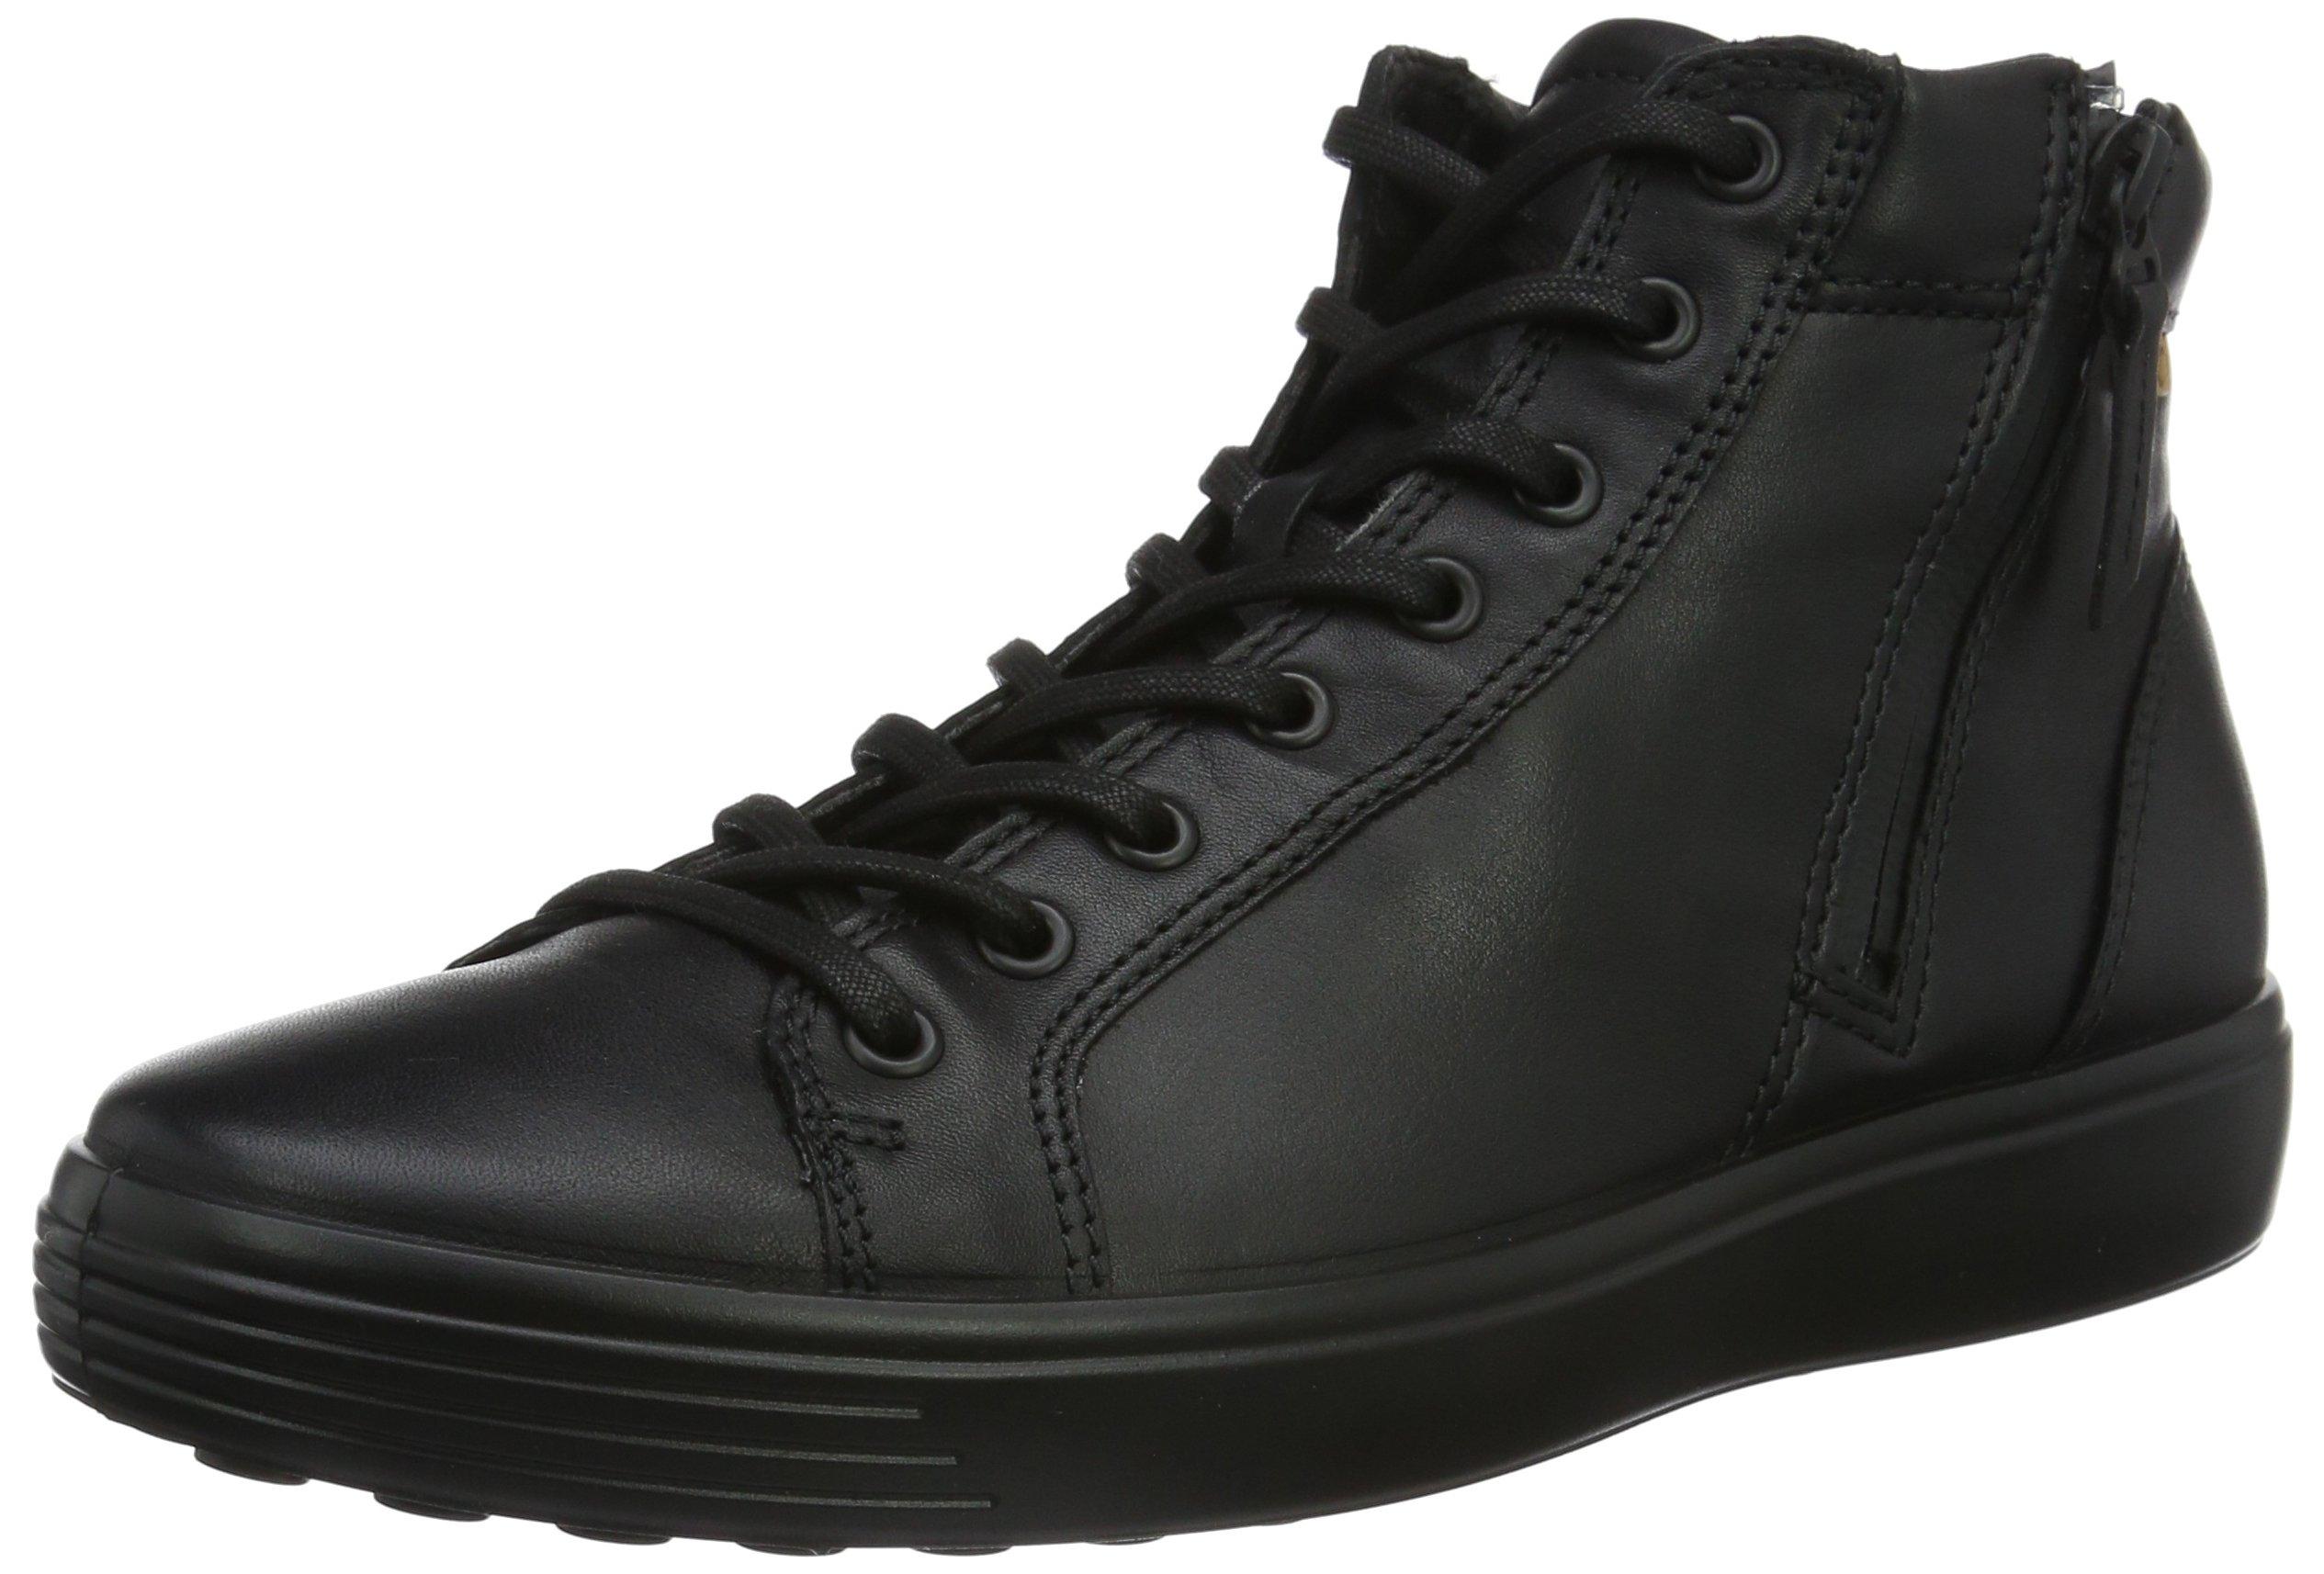 lion43 Ecco Hautes Soft 7Sneakers Eu HommeNoir59075black v0ywm8nPNO